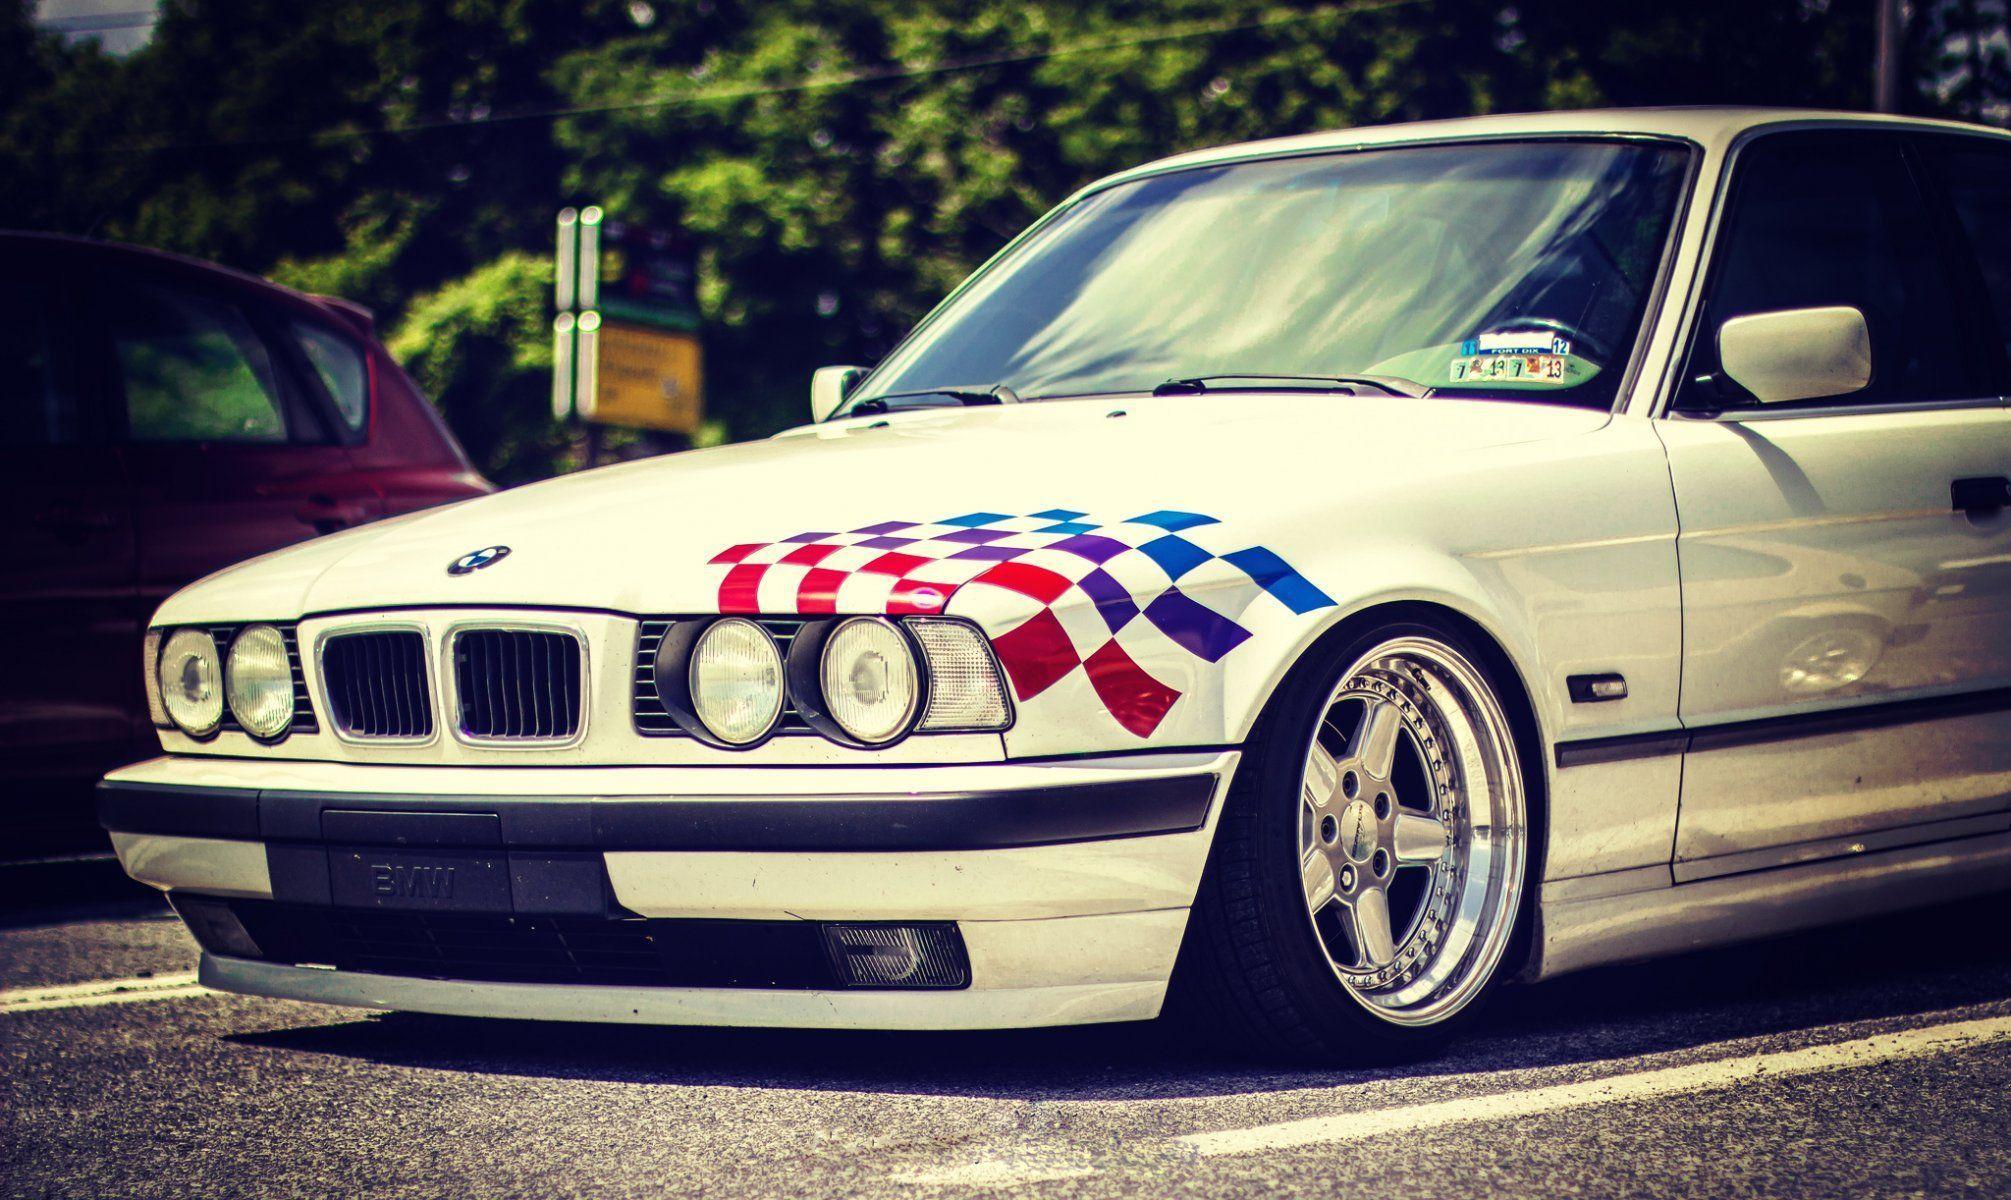 BMW E34 Wallpapers - Wallpaper Cave